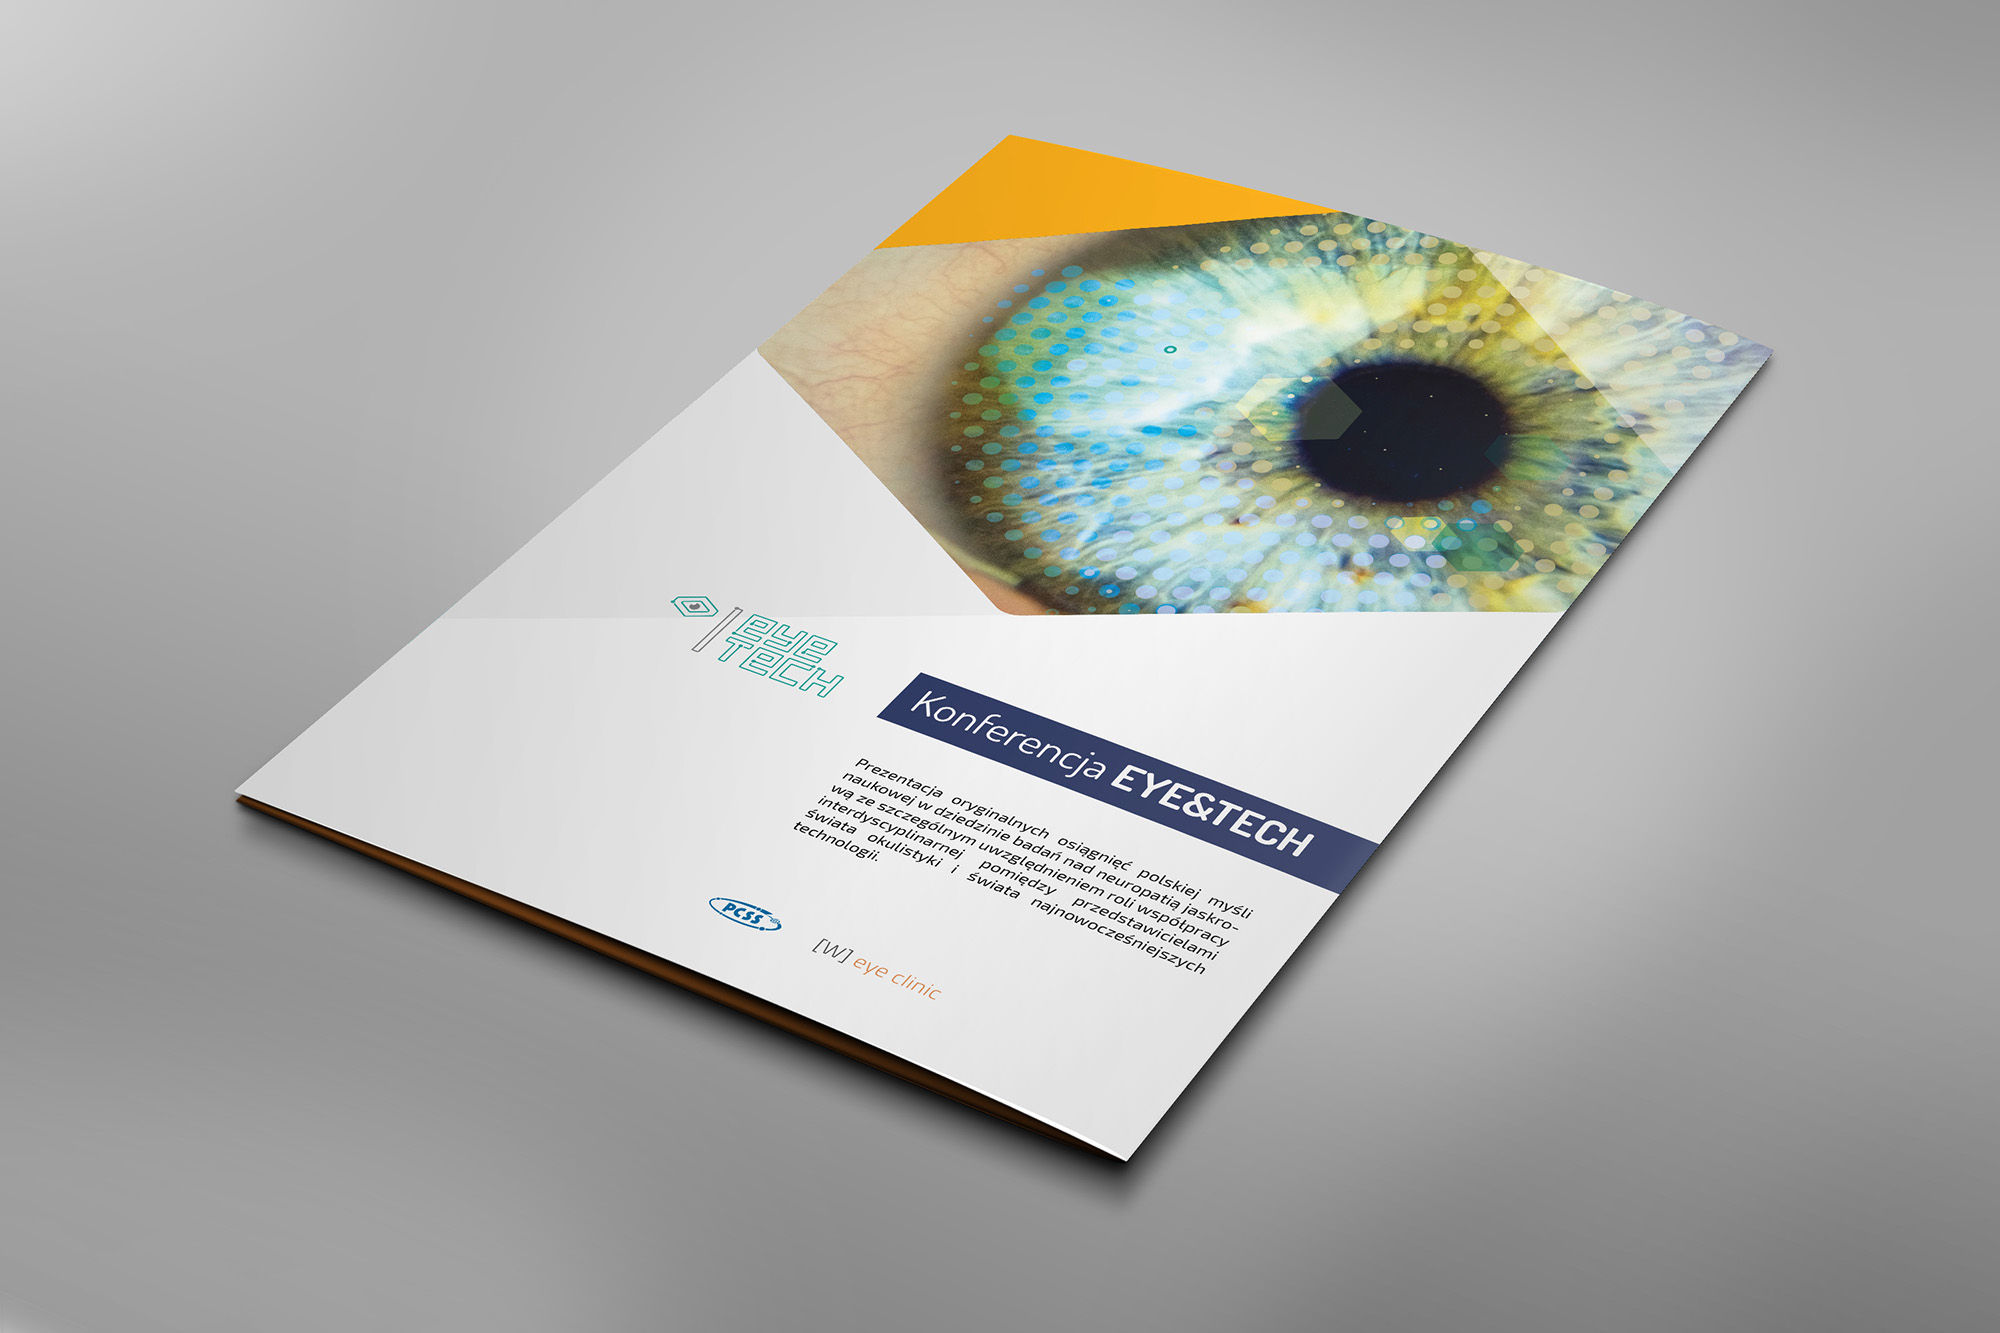 projekty graficzne, design folder, newspaper, ilustracja, concept art, key visual, designer Ireneusz Bloch, pcss